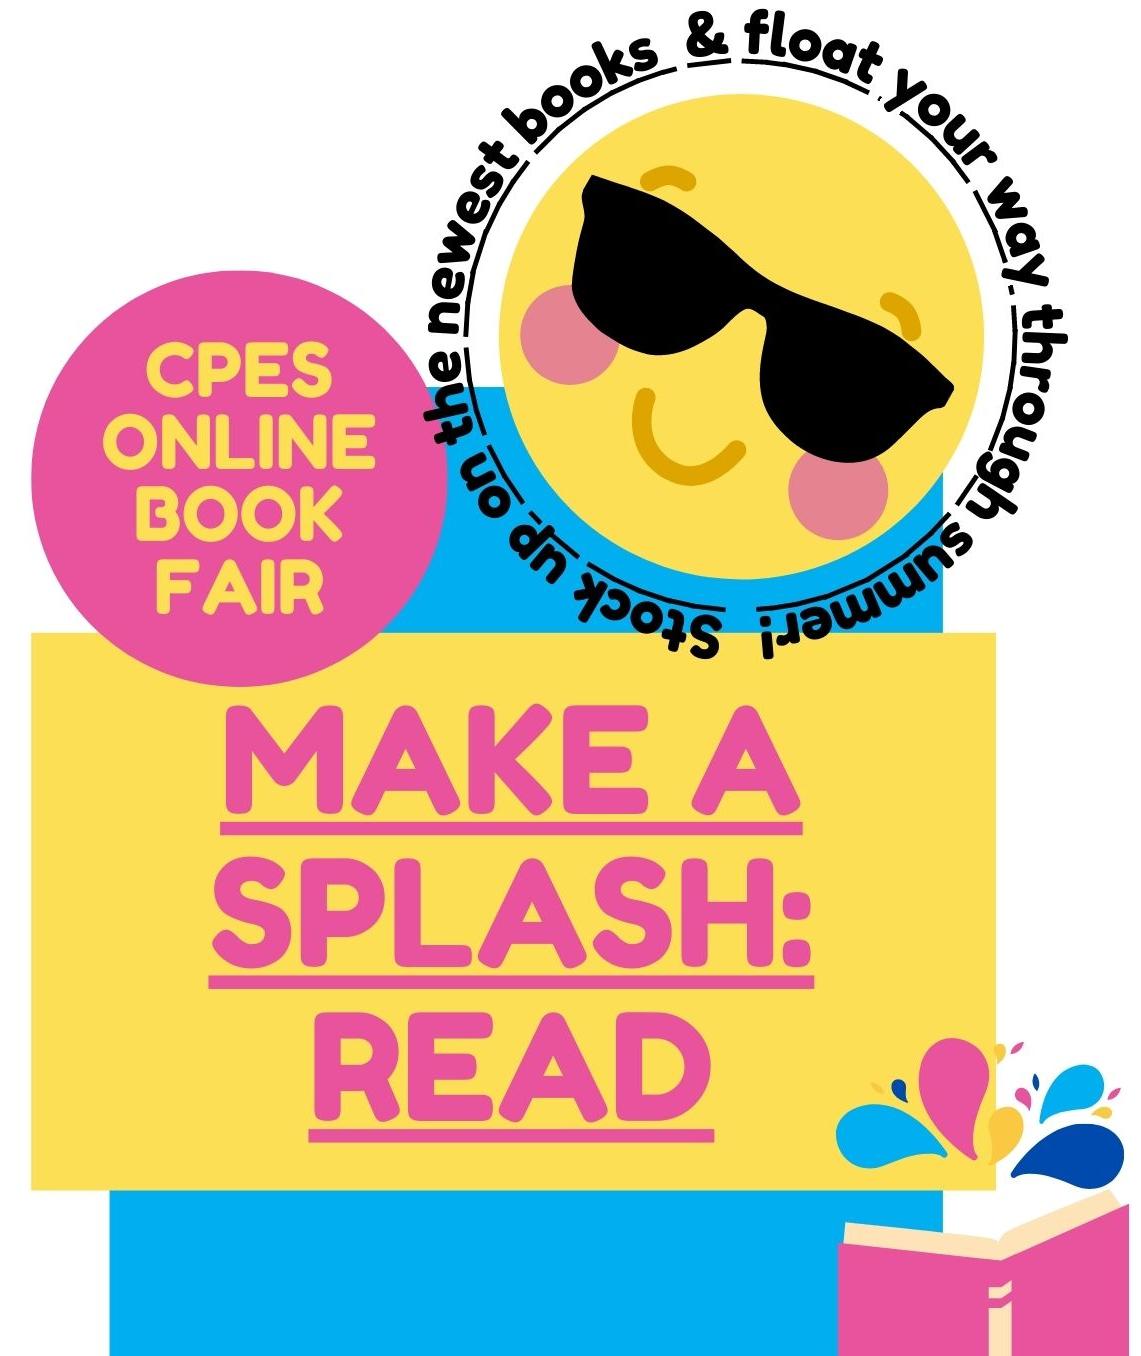 Spring 2021 Book Fair graphic